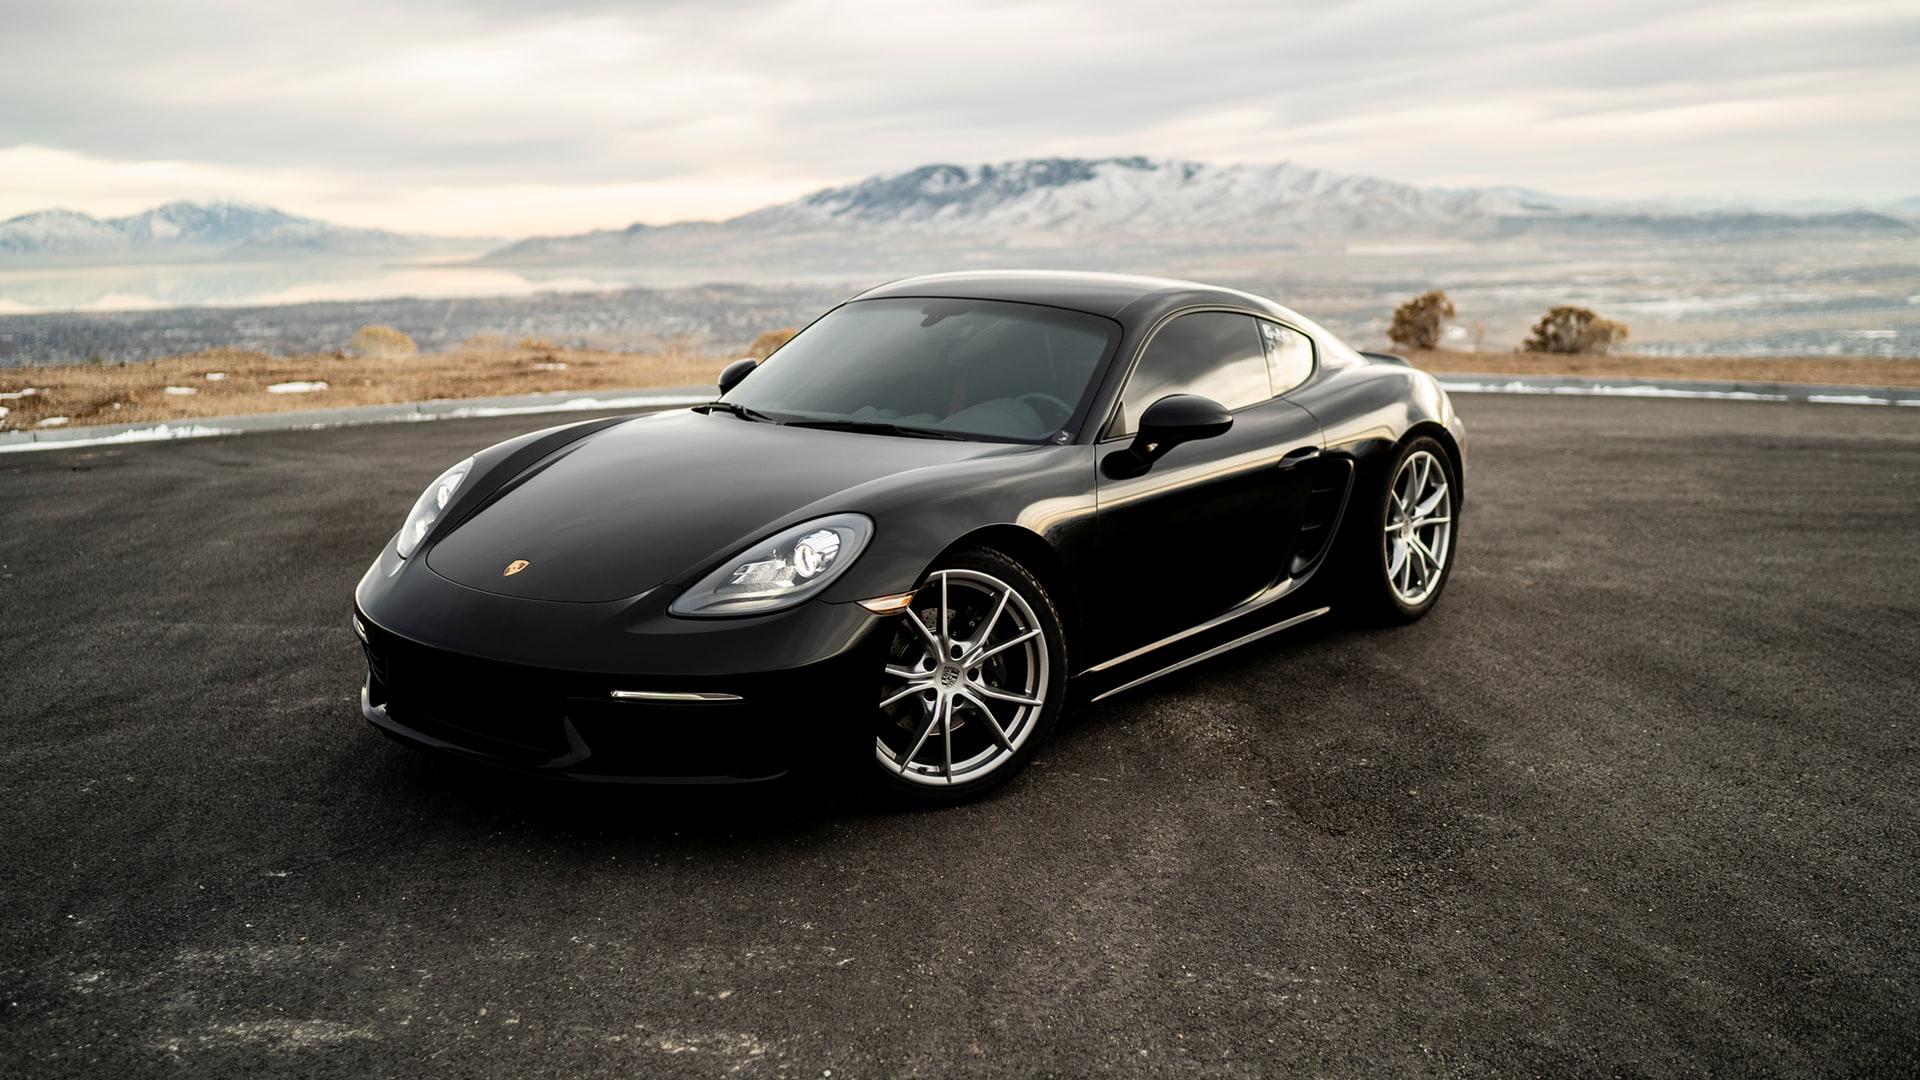 Porsche stops production due to the Coronavirus - Brand Spur